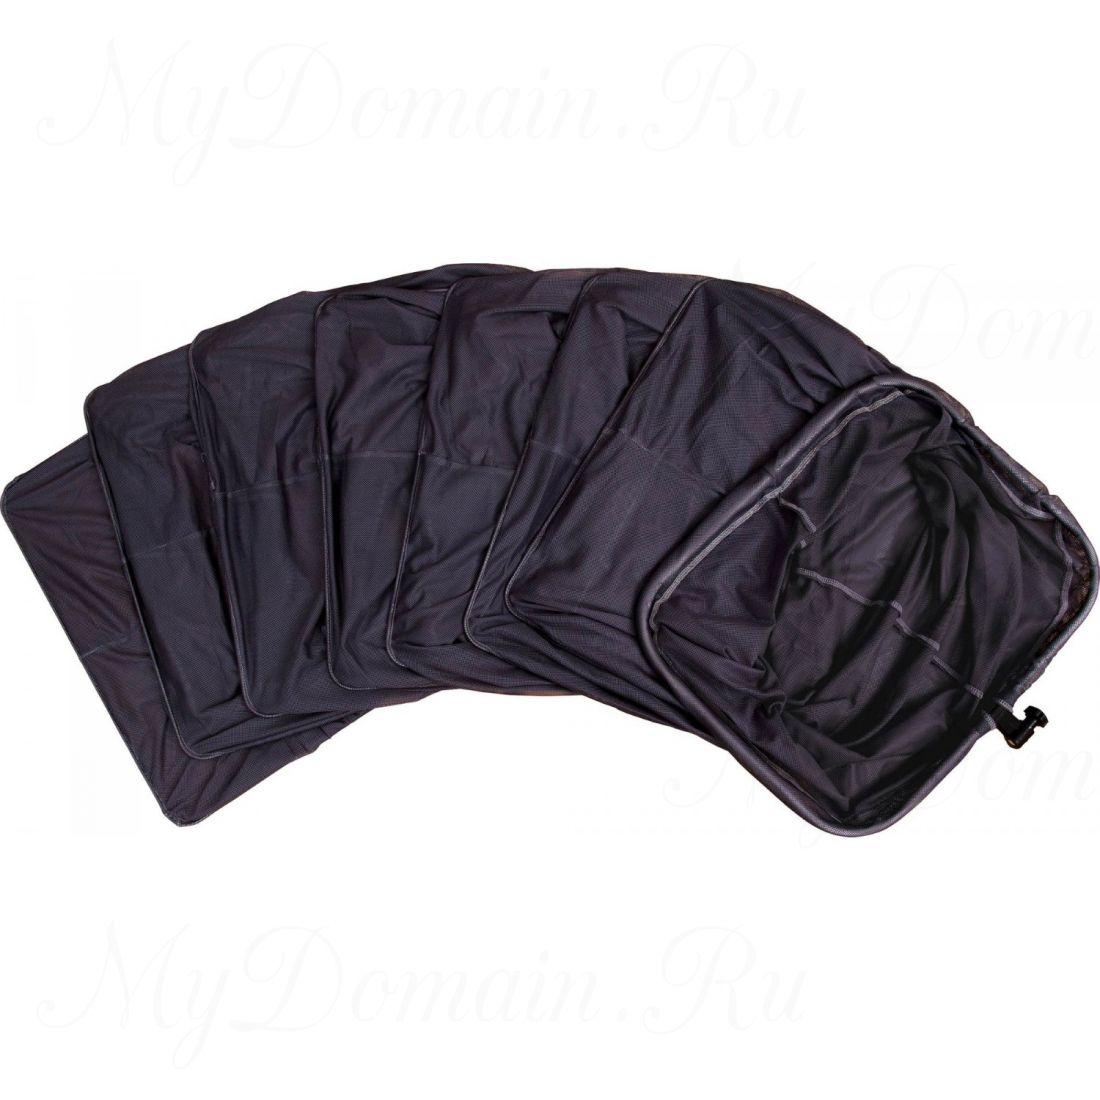 Садок квадратный Browning Сommercial Silver Keep Net, длина 2.5 метра, 42x35 см. (7012250)